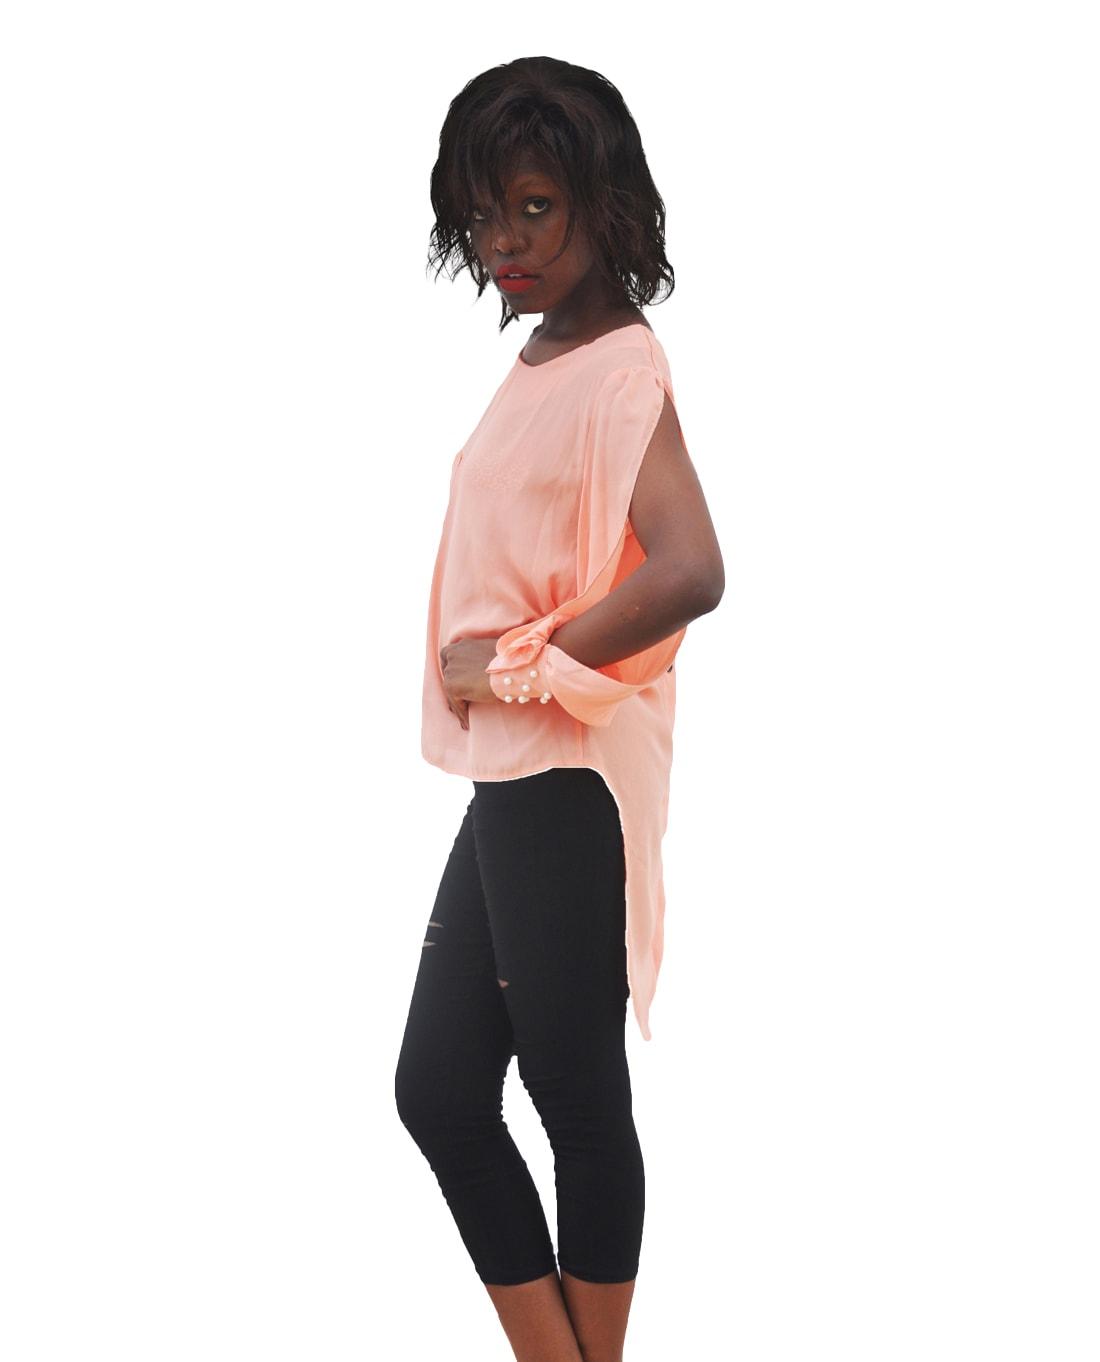 M0290 peach2 Blouses Tops Shirts maureens.com boutique